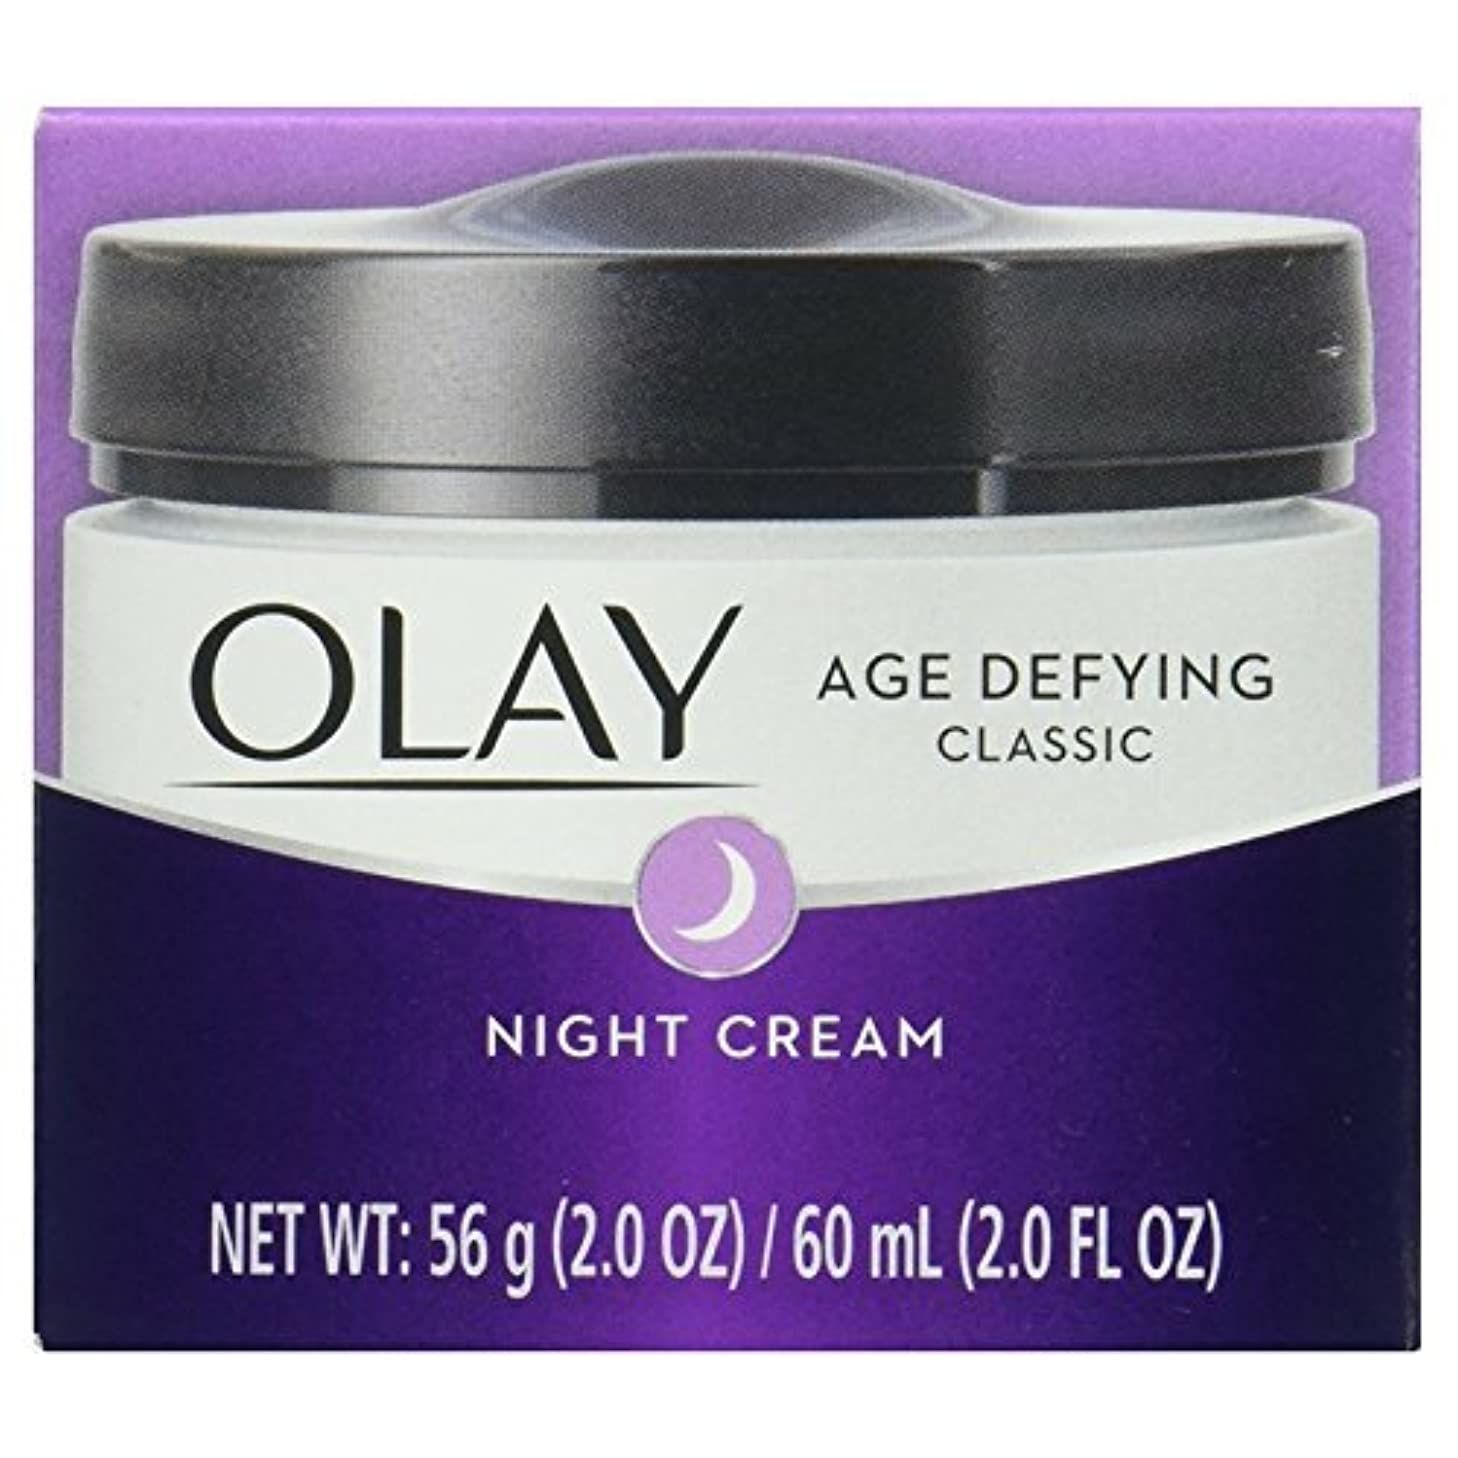 Olay Age Defying intensive nourshing night cream (並行輸入品)